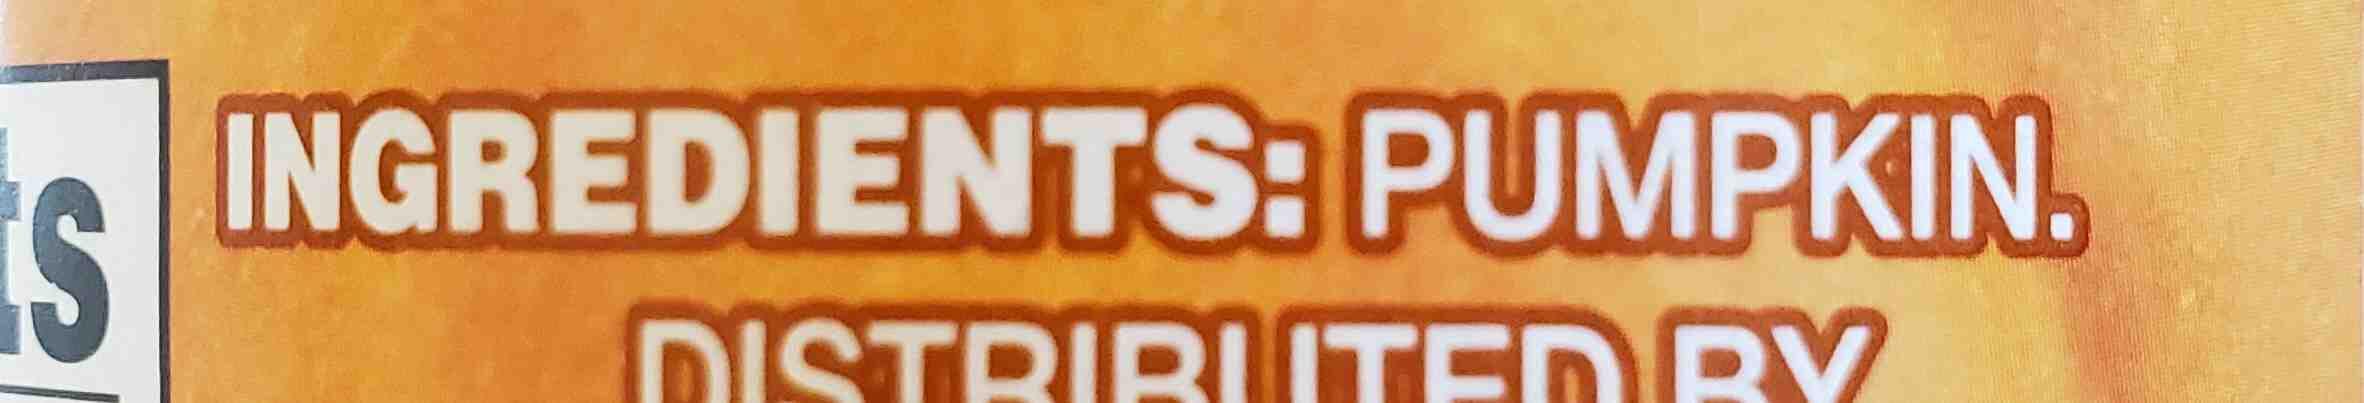 pumpkin - Ingredients